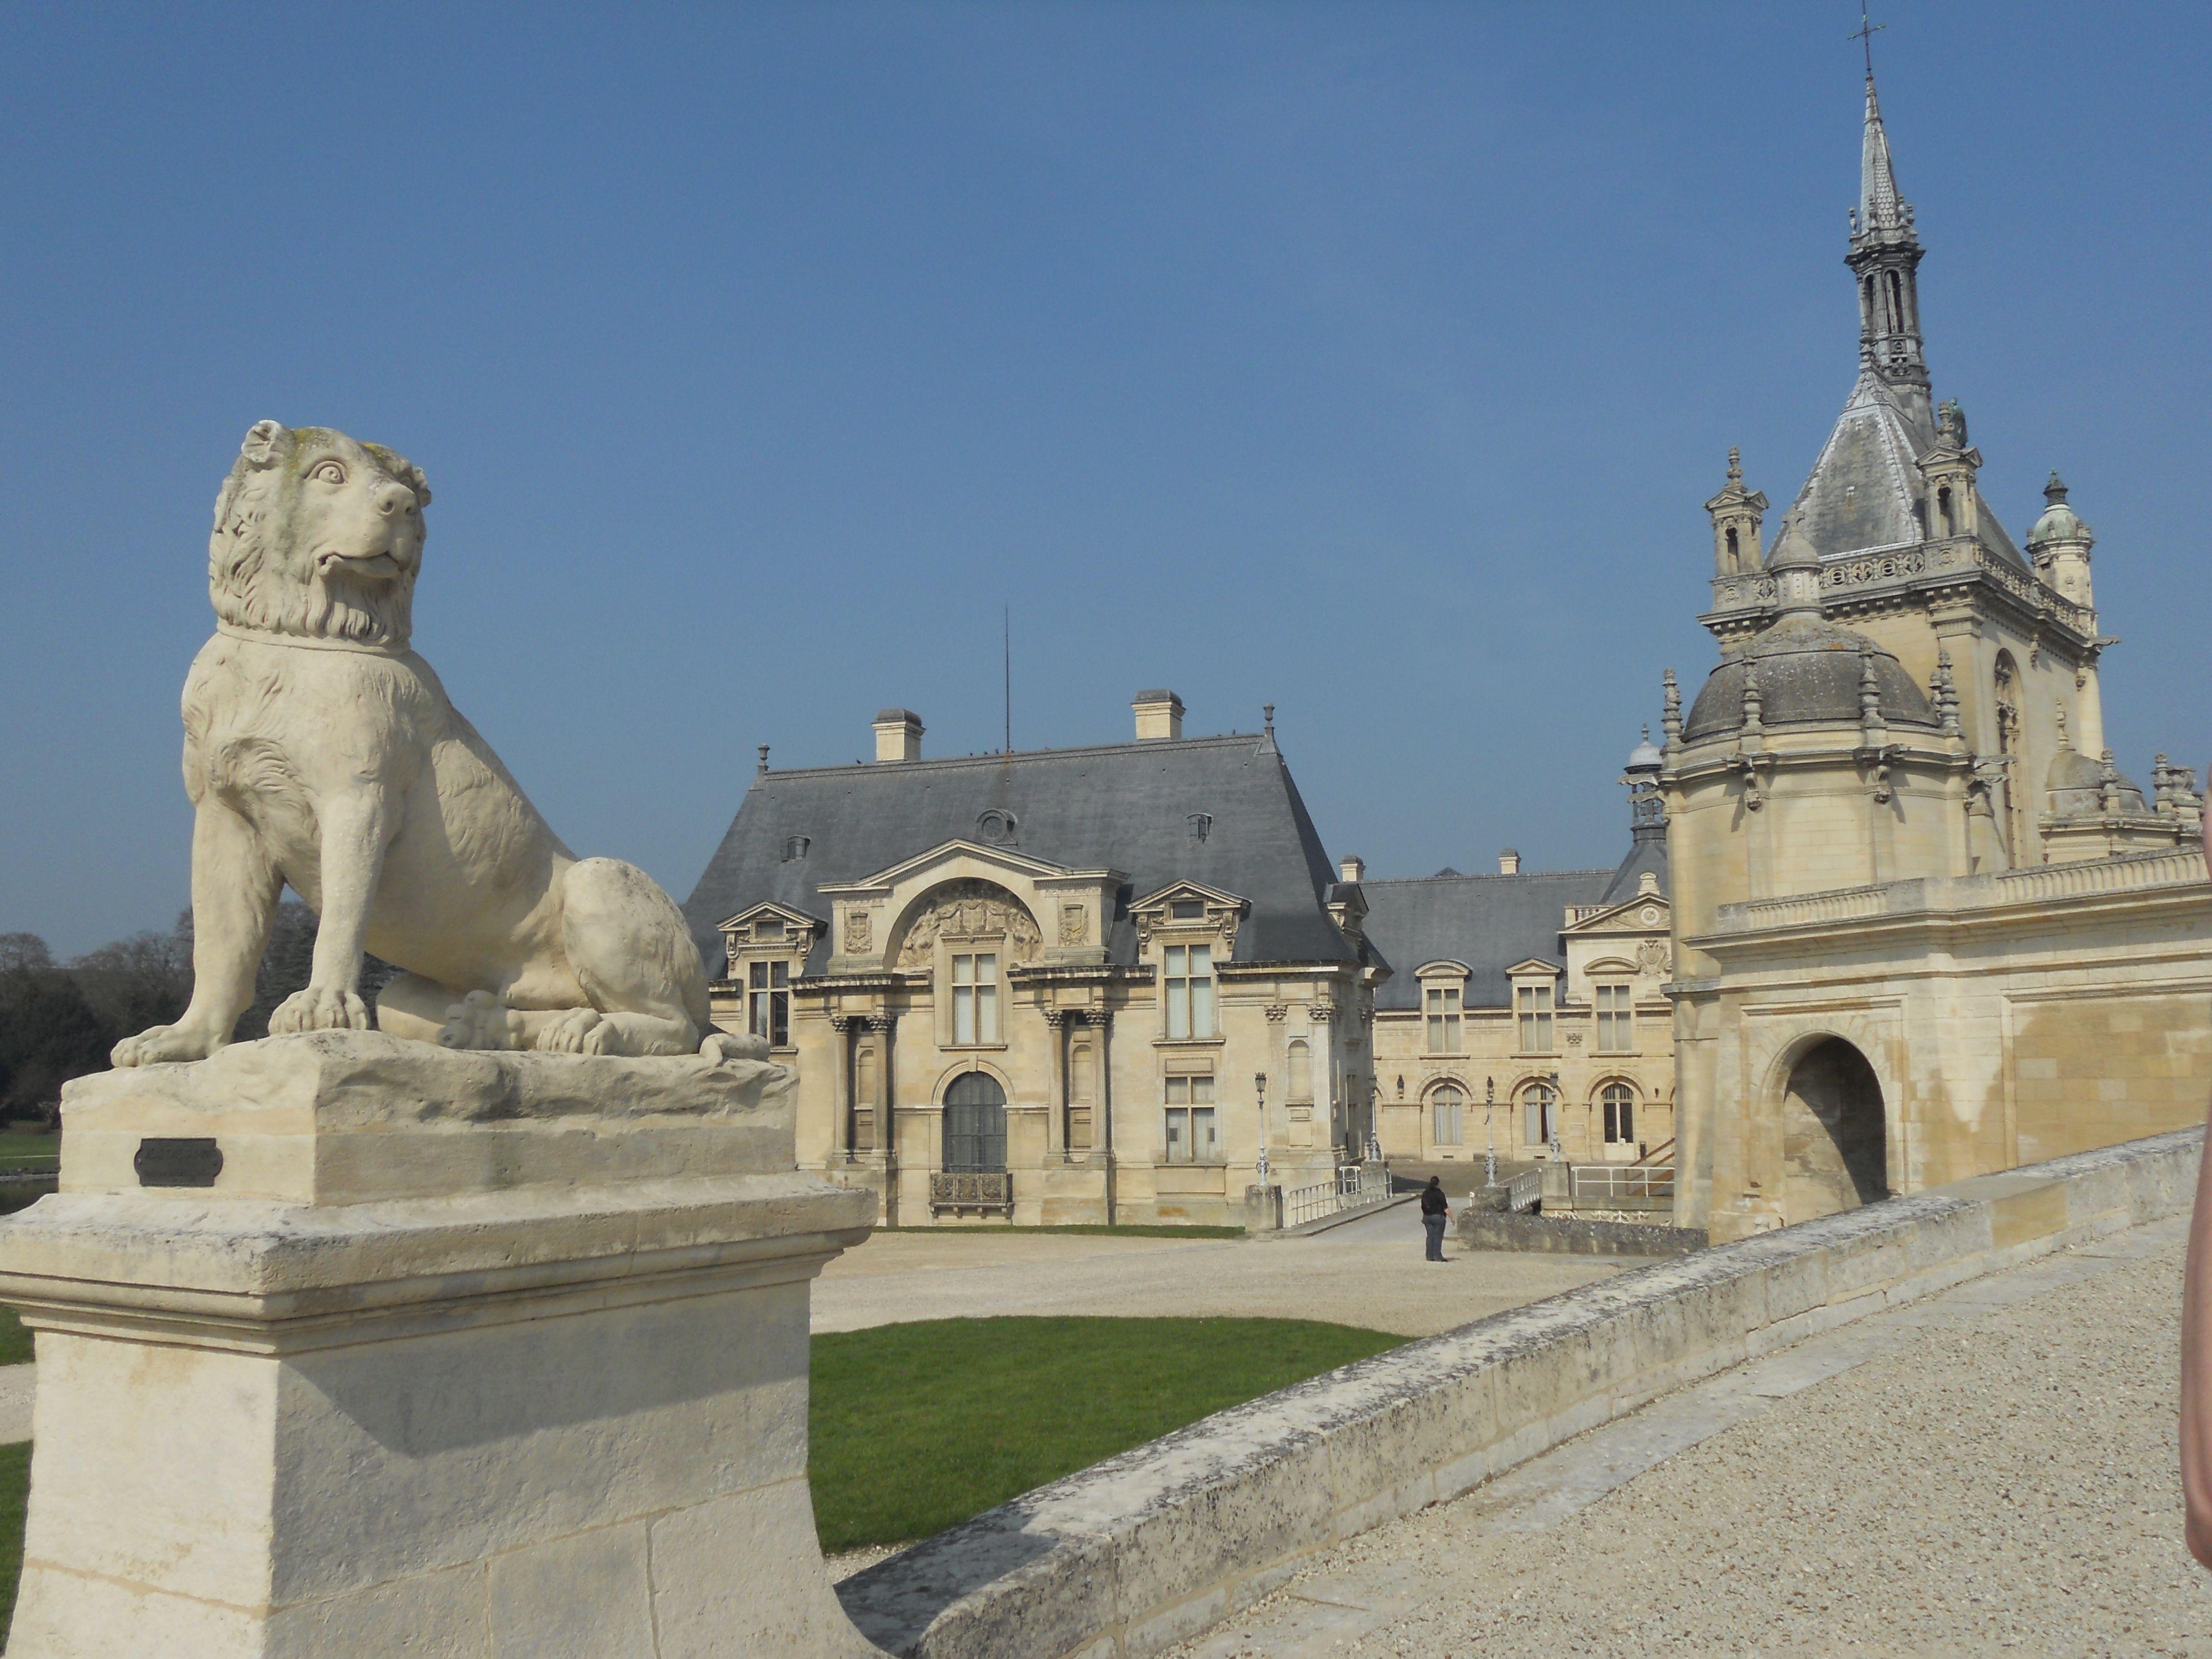 château de chantilly - Bing Images